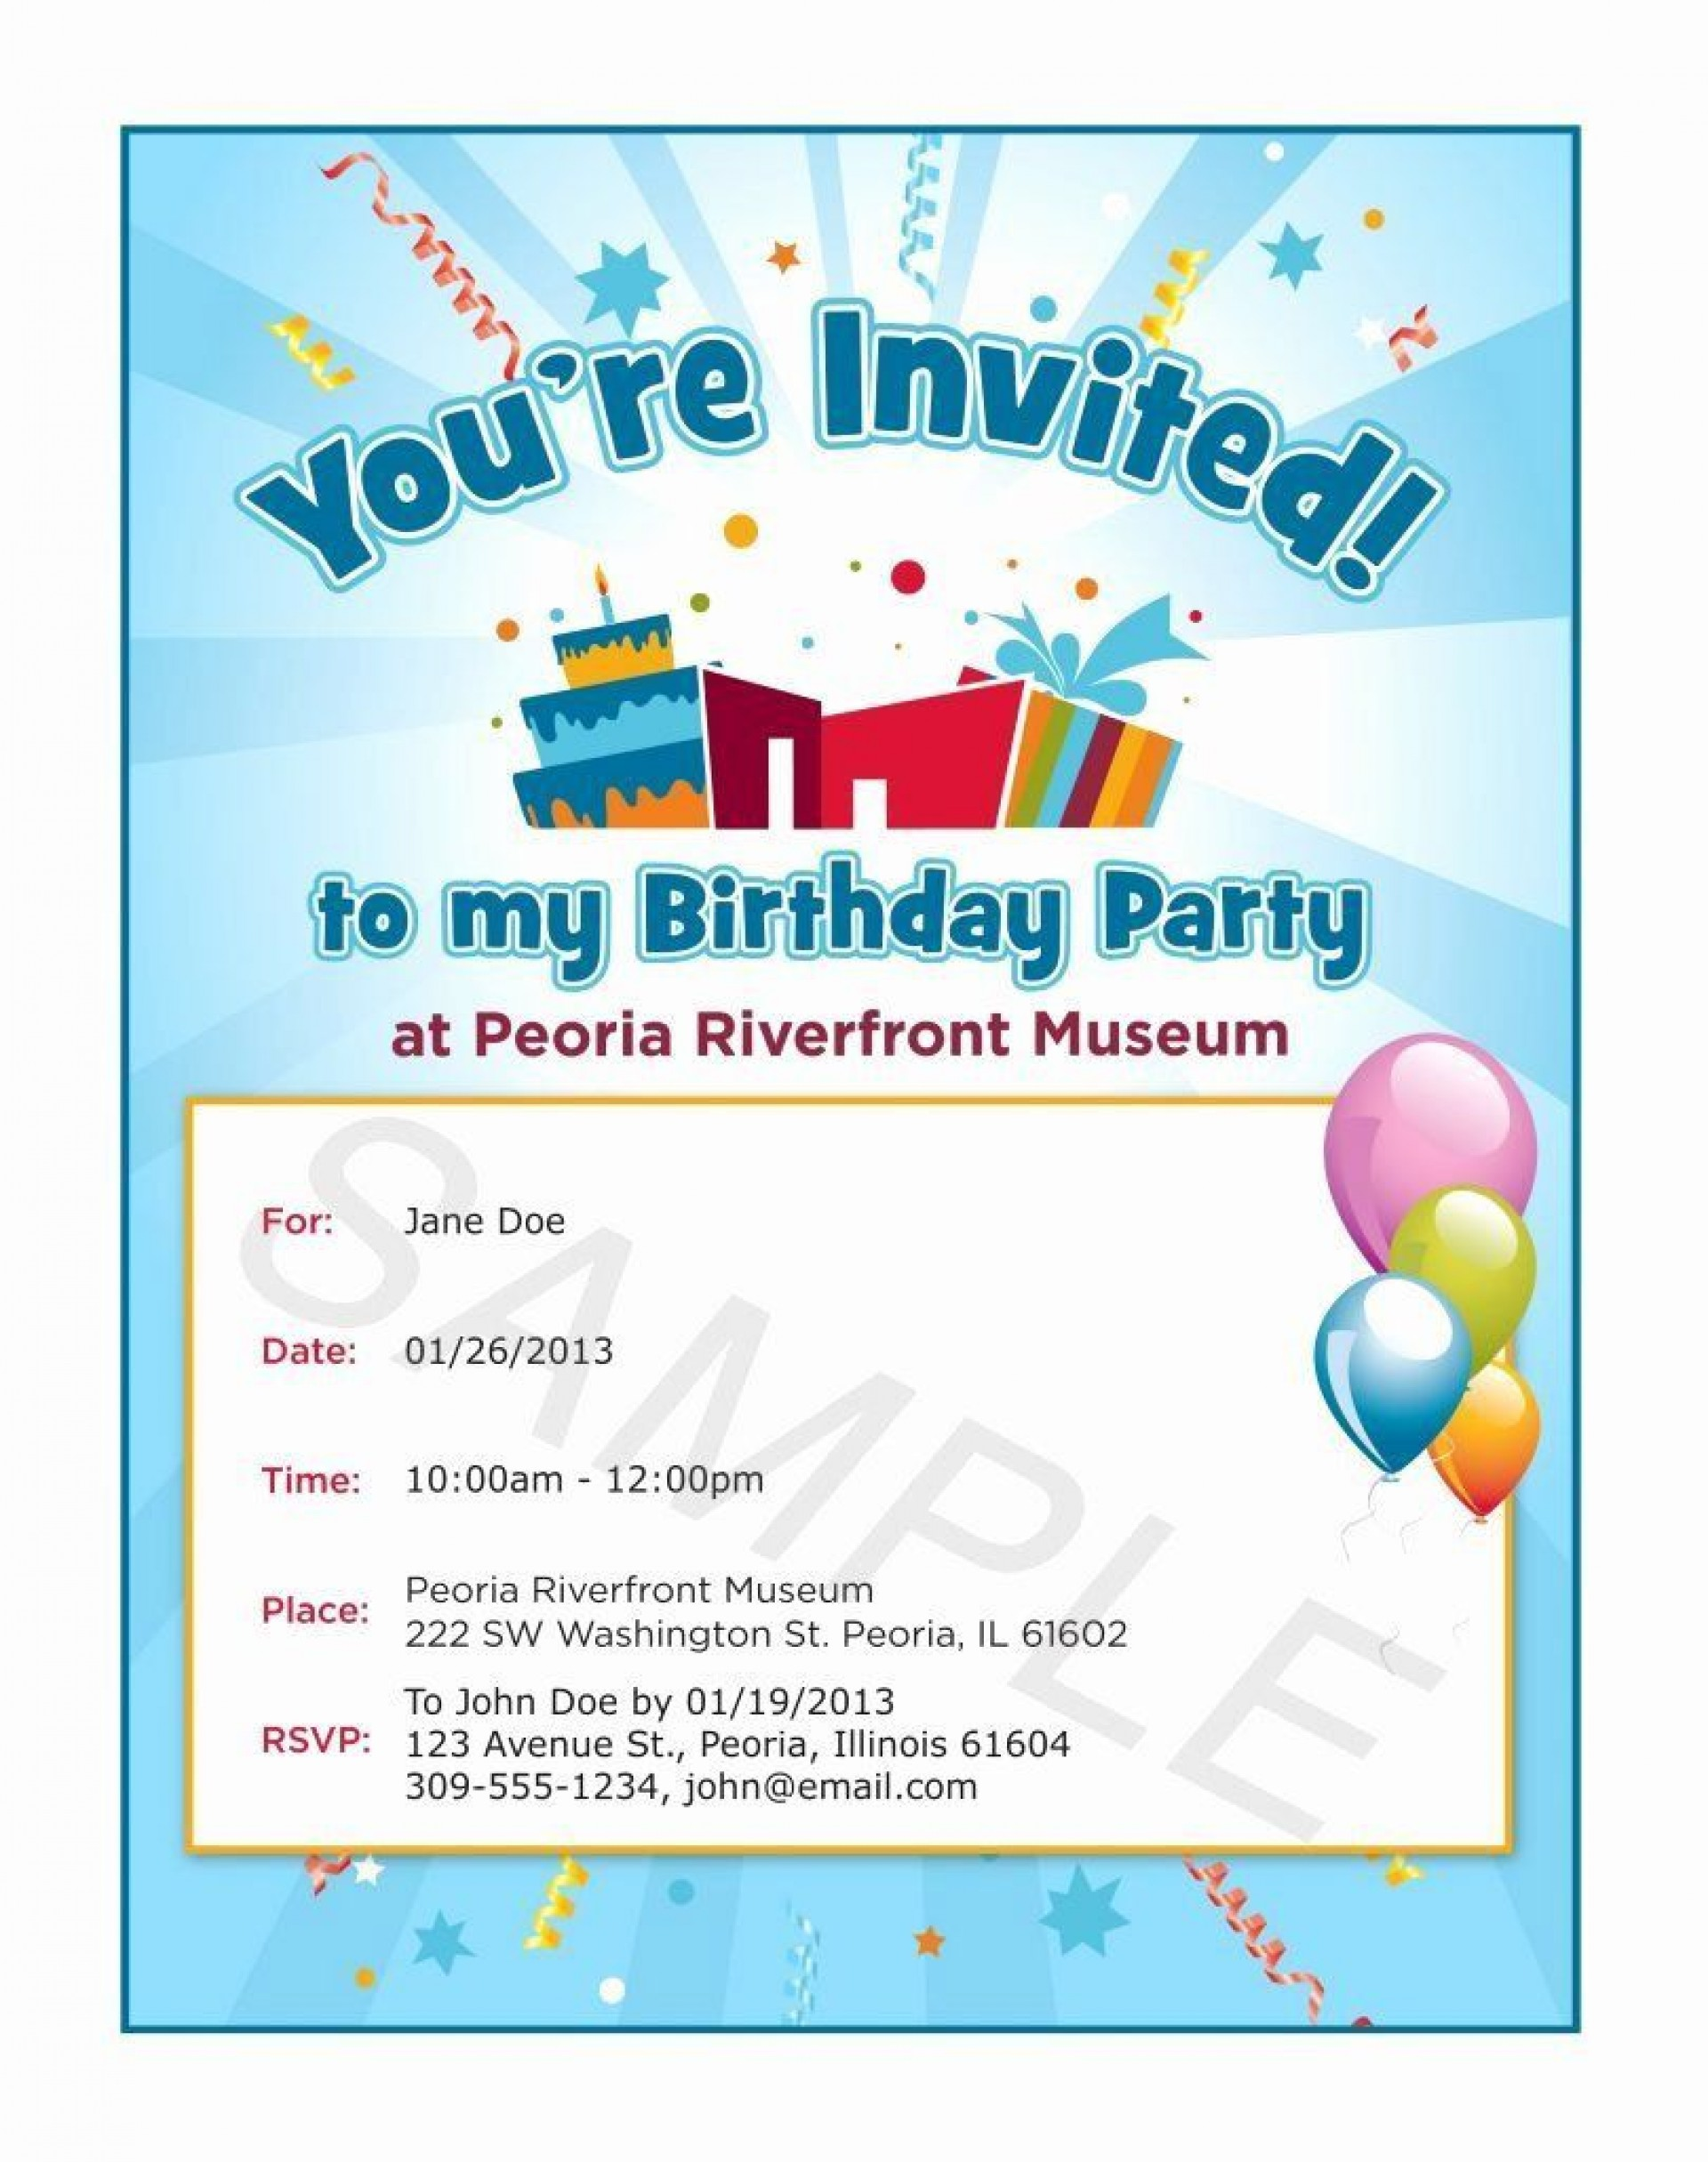 005 Exceptional Birthday Party Invitation Template Word Free Idea  Download Invite1920